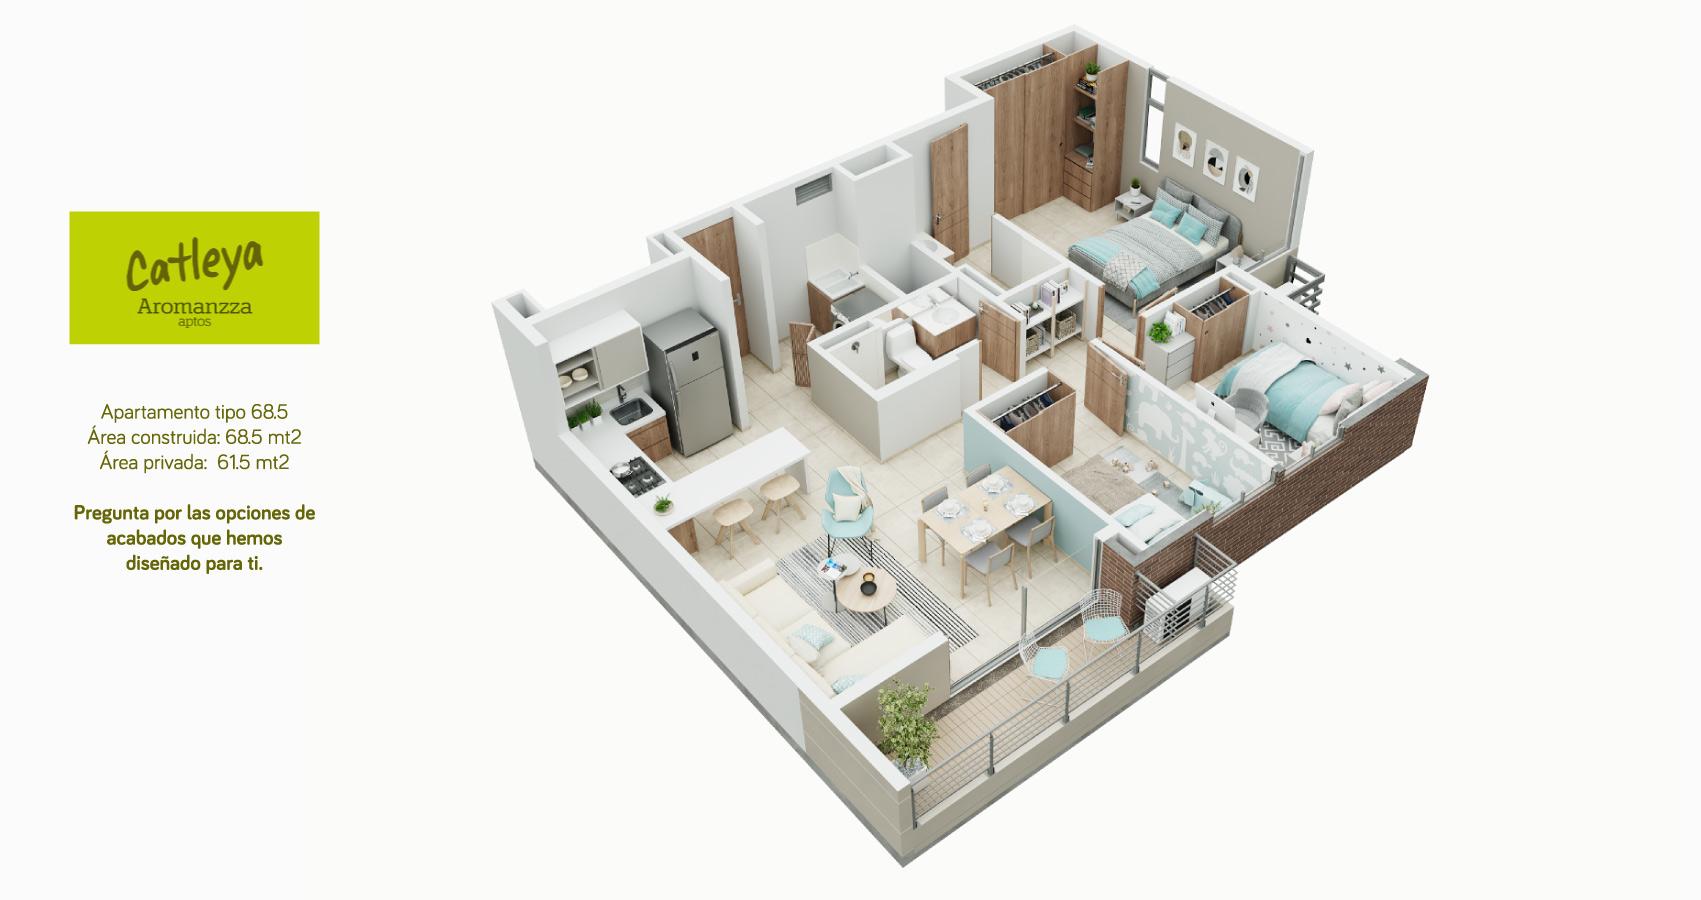 Apartamento tipo 68 Catleya - Aromanza